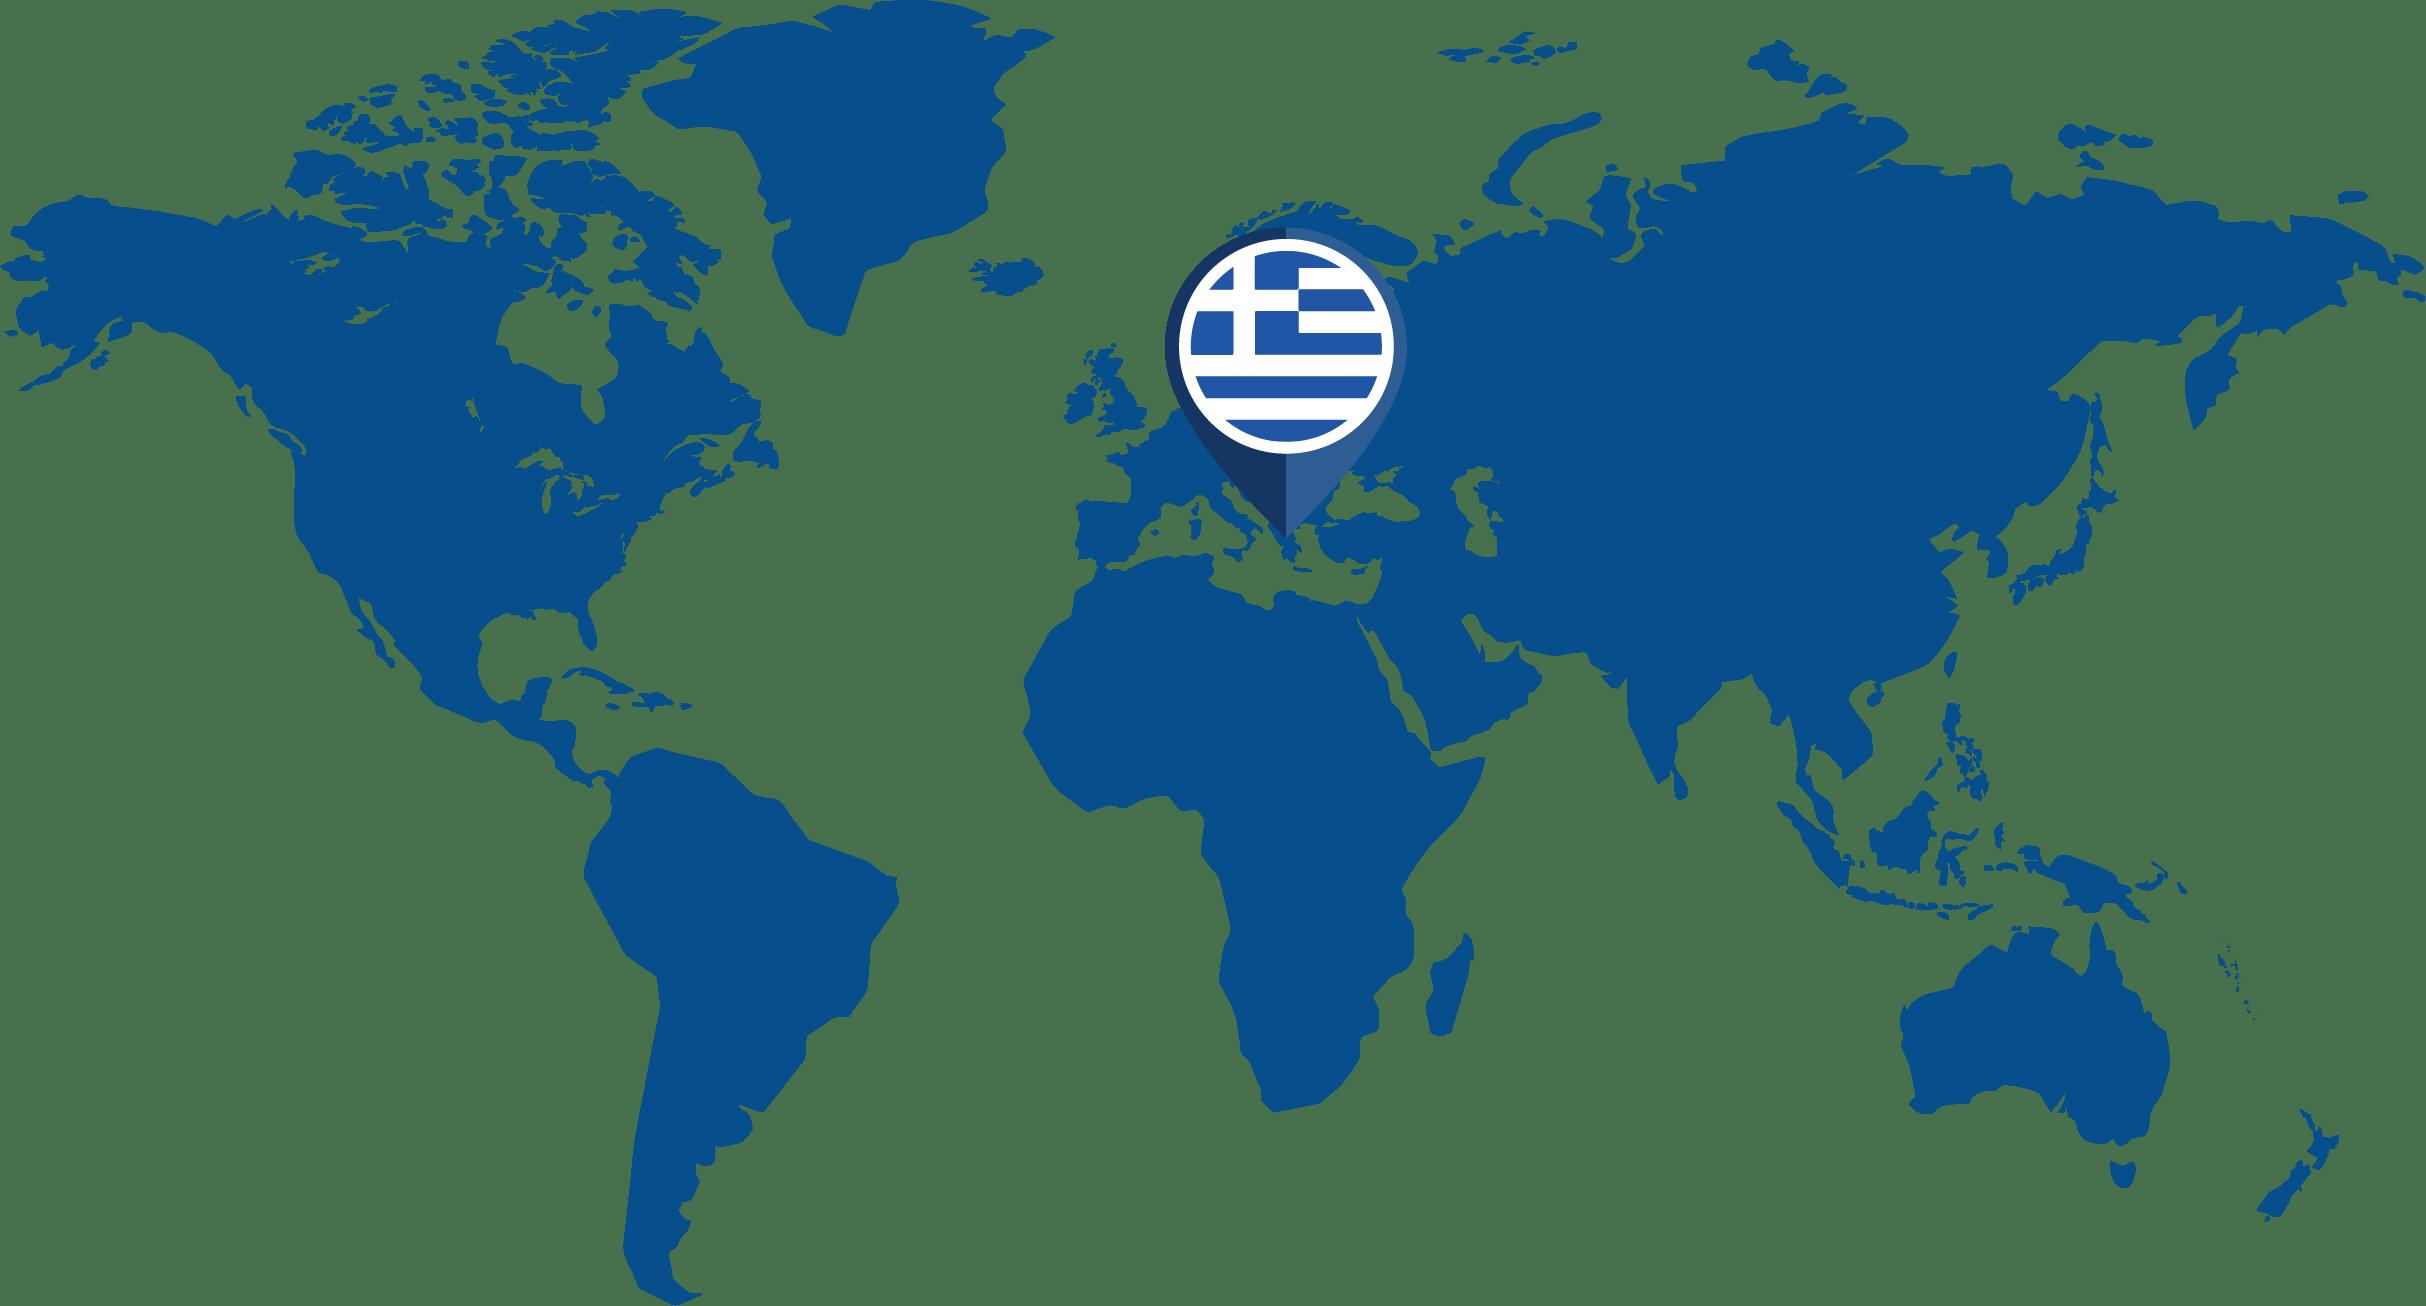 https://bluemina.com/wp-content/uploads/2020/02/Greece-map-and-flag-1.png